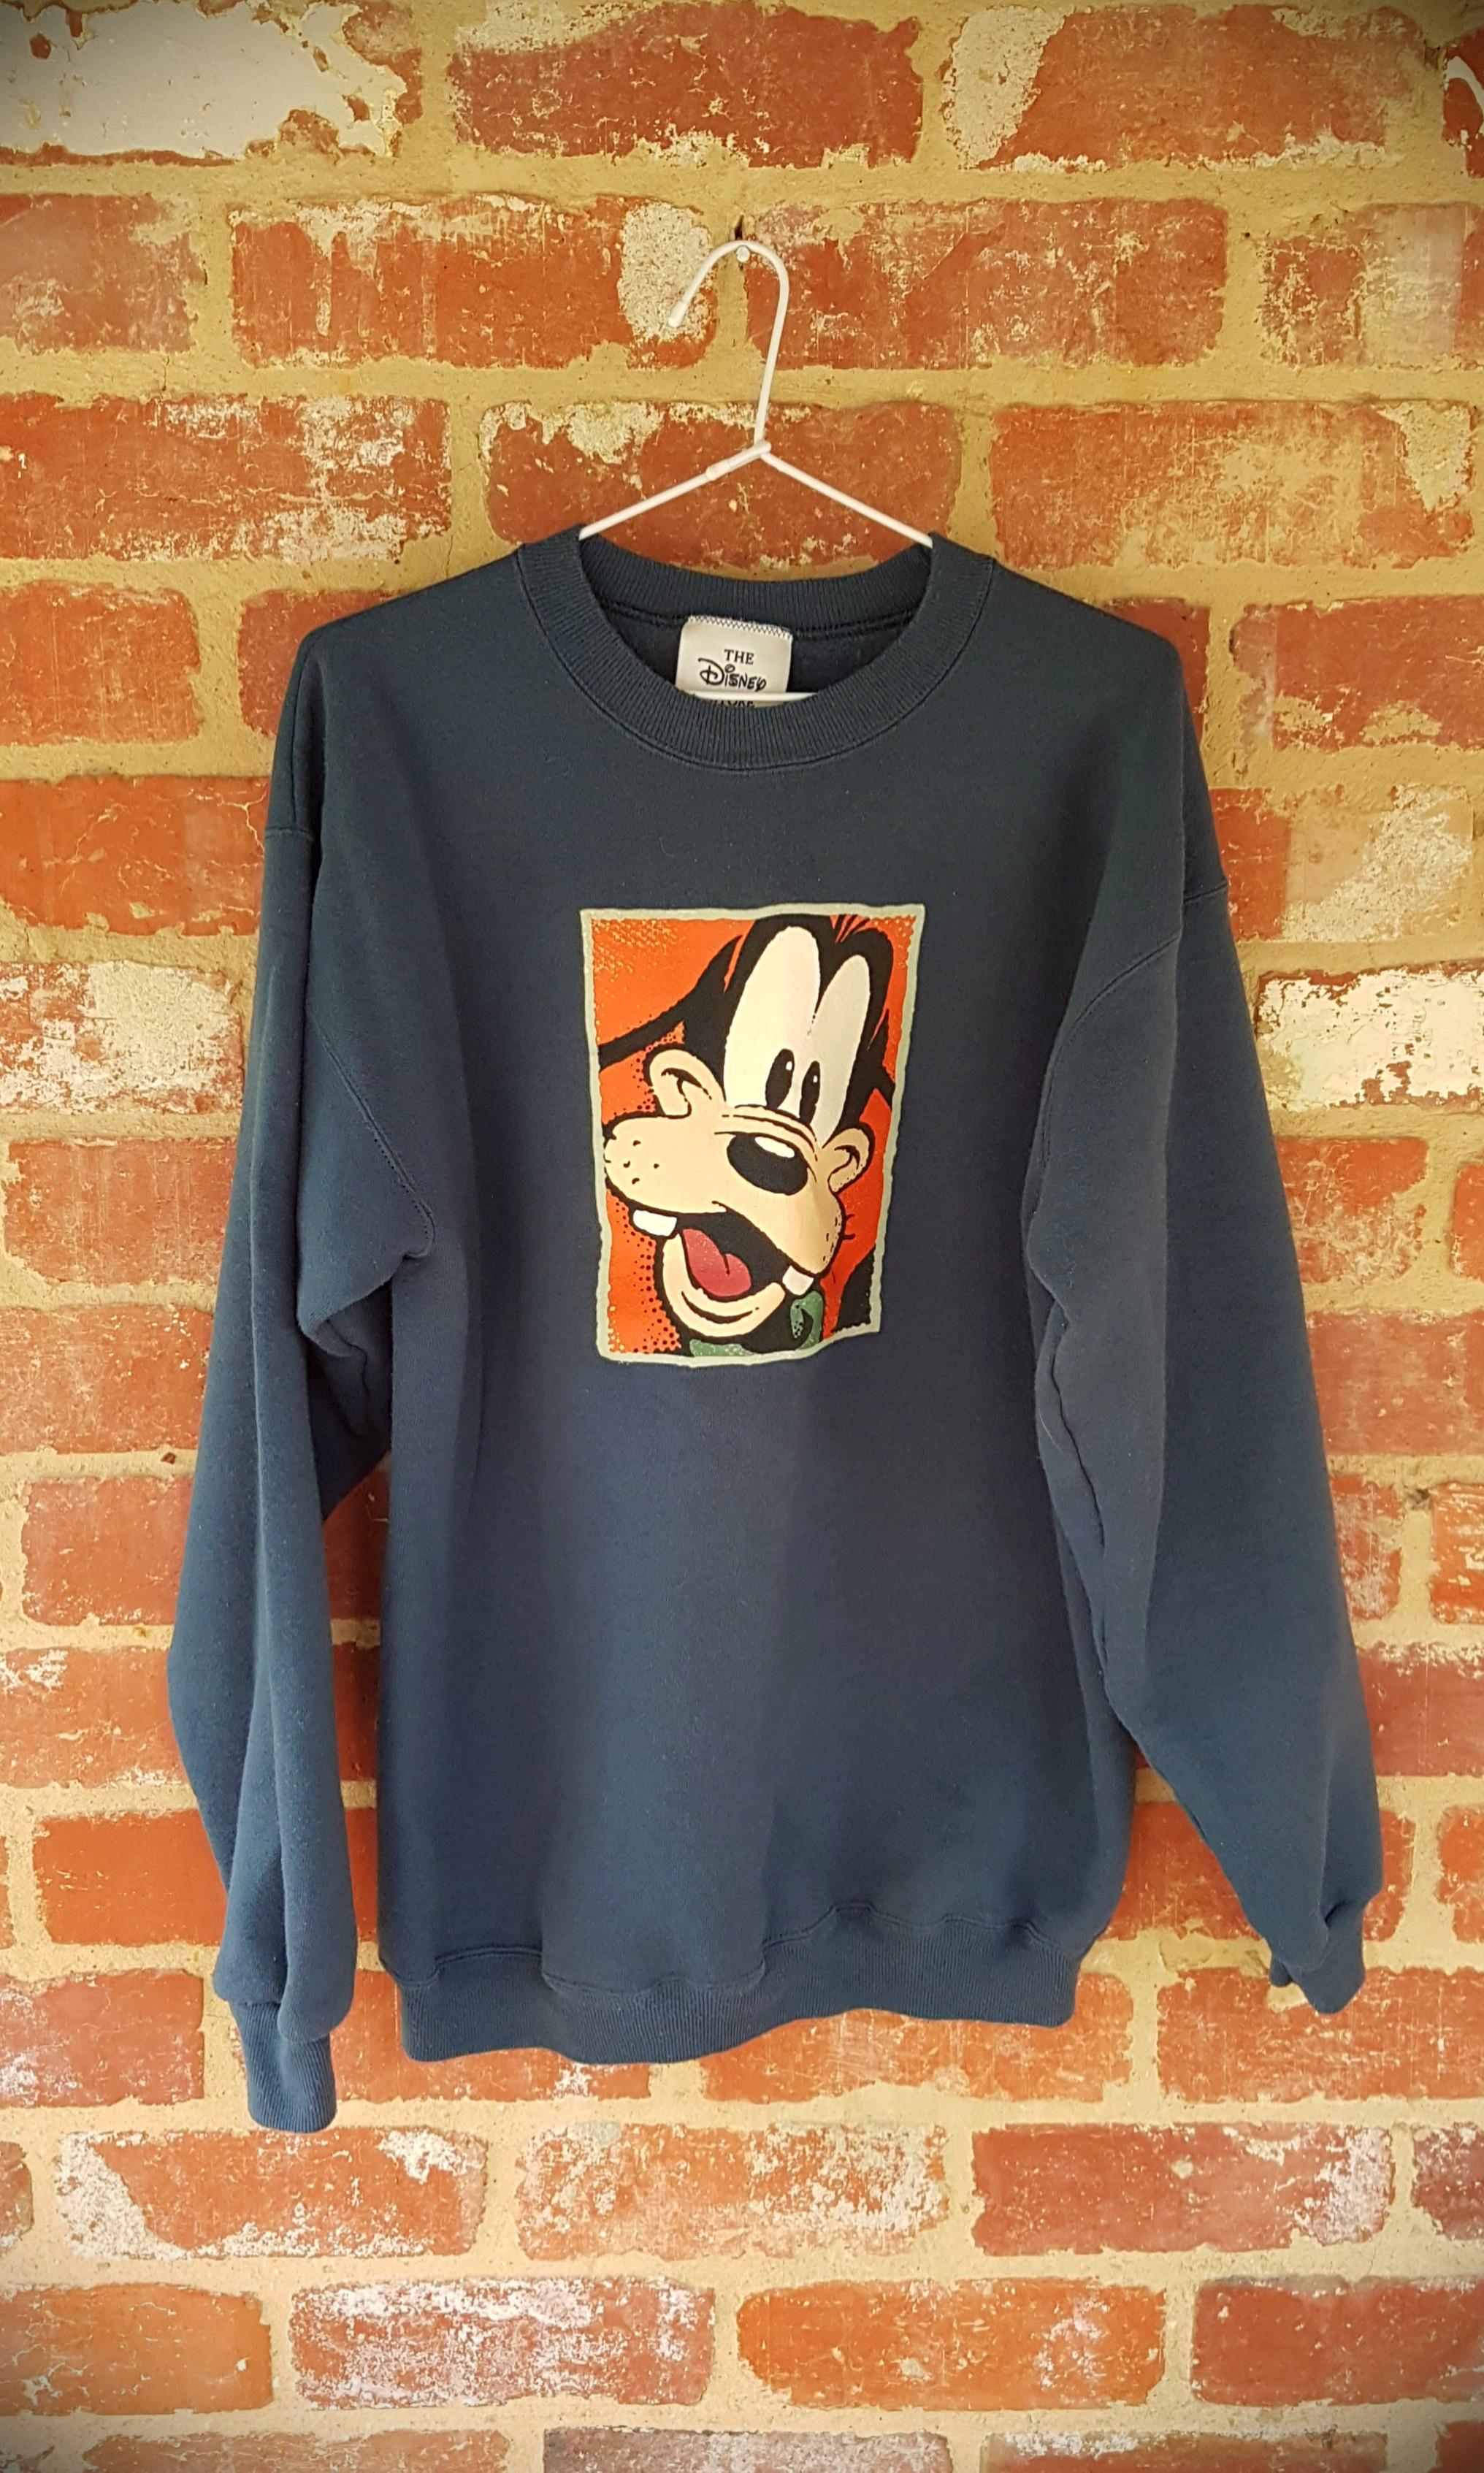 Vintage Disney Goofy Teal Crew Neck Jumper M  - Free Post